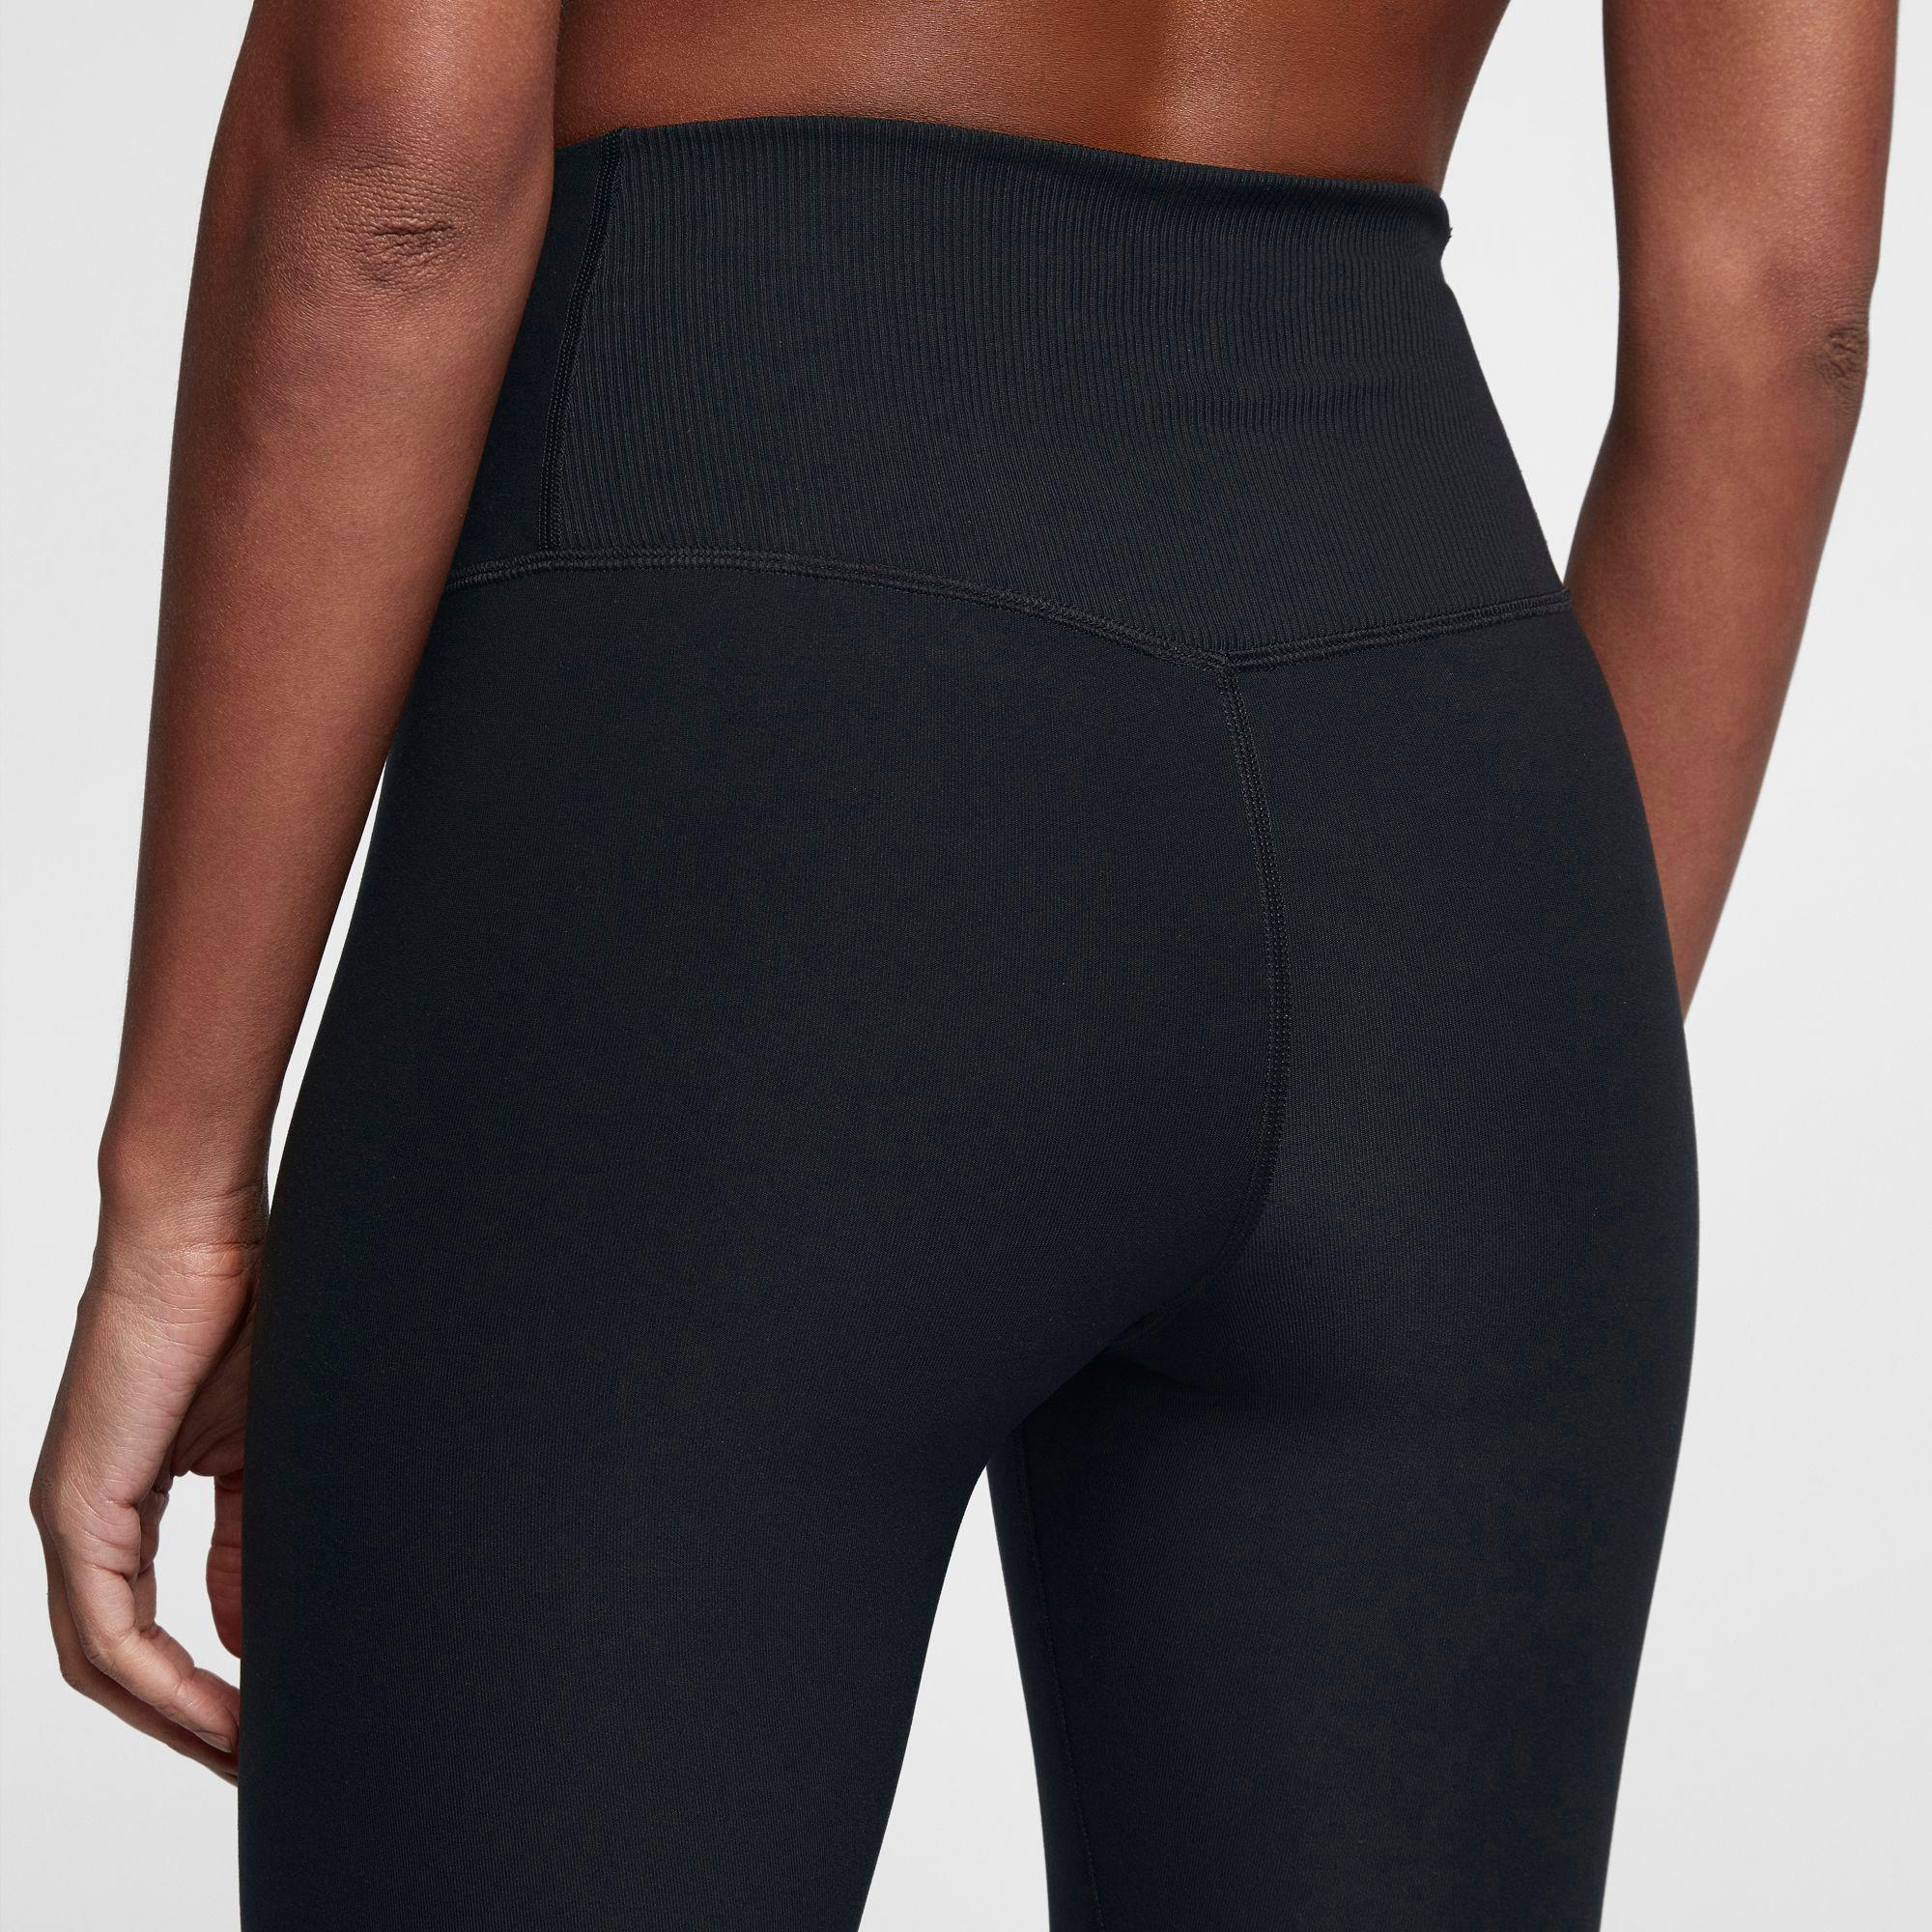 881ed9f3 Nike Black Sculpt Hyper Crop Leggings